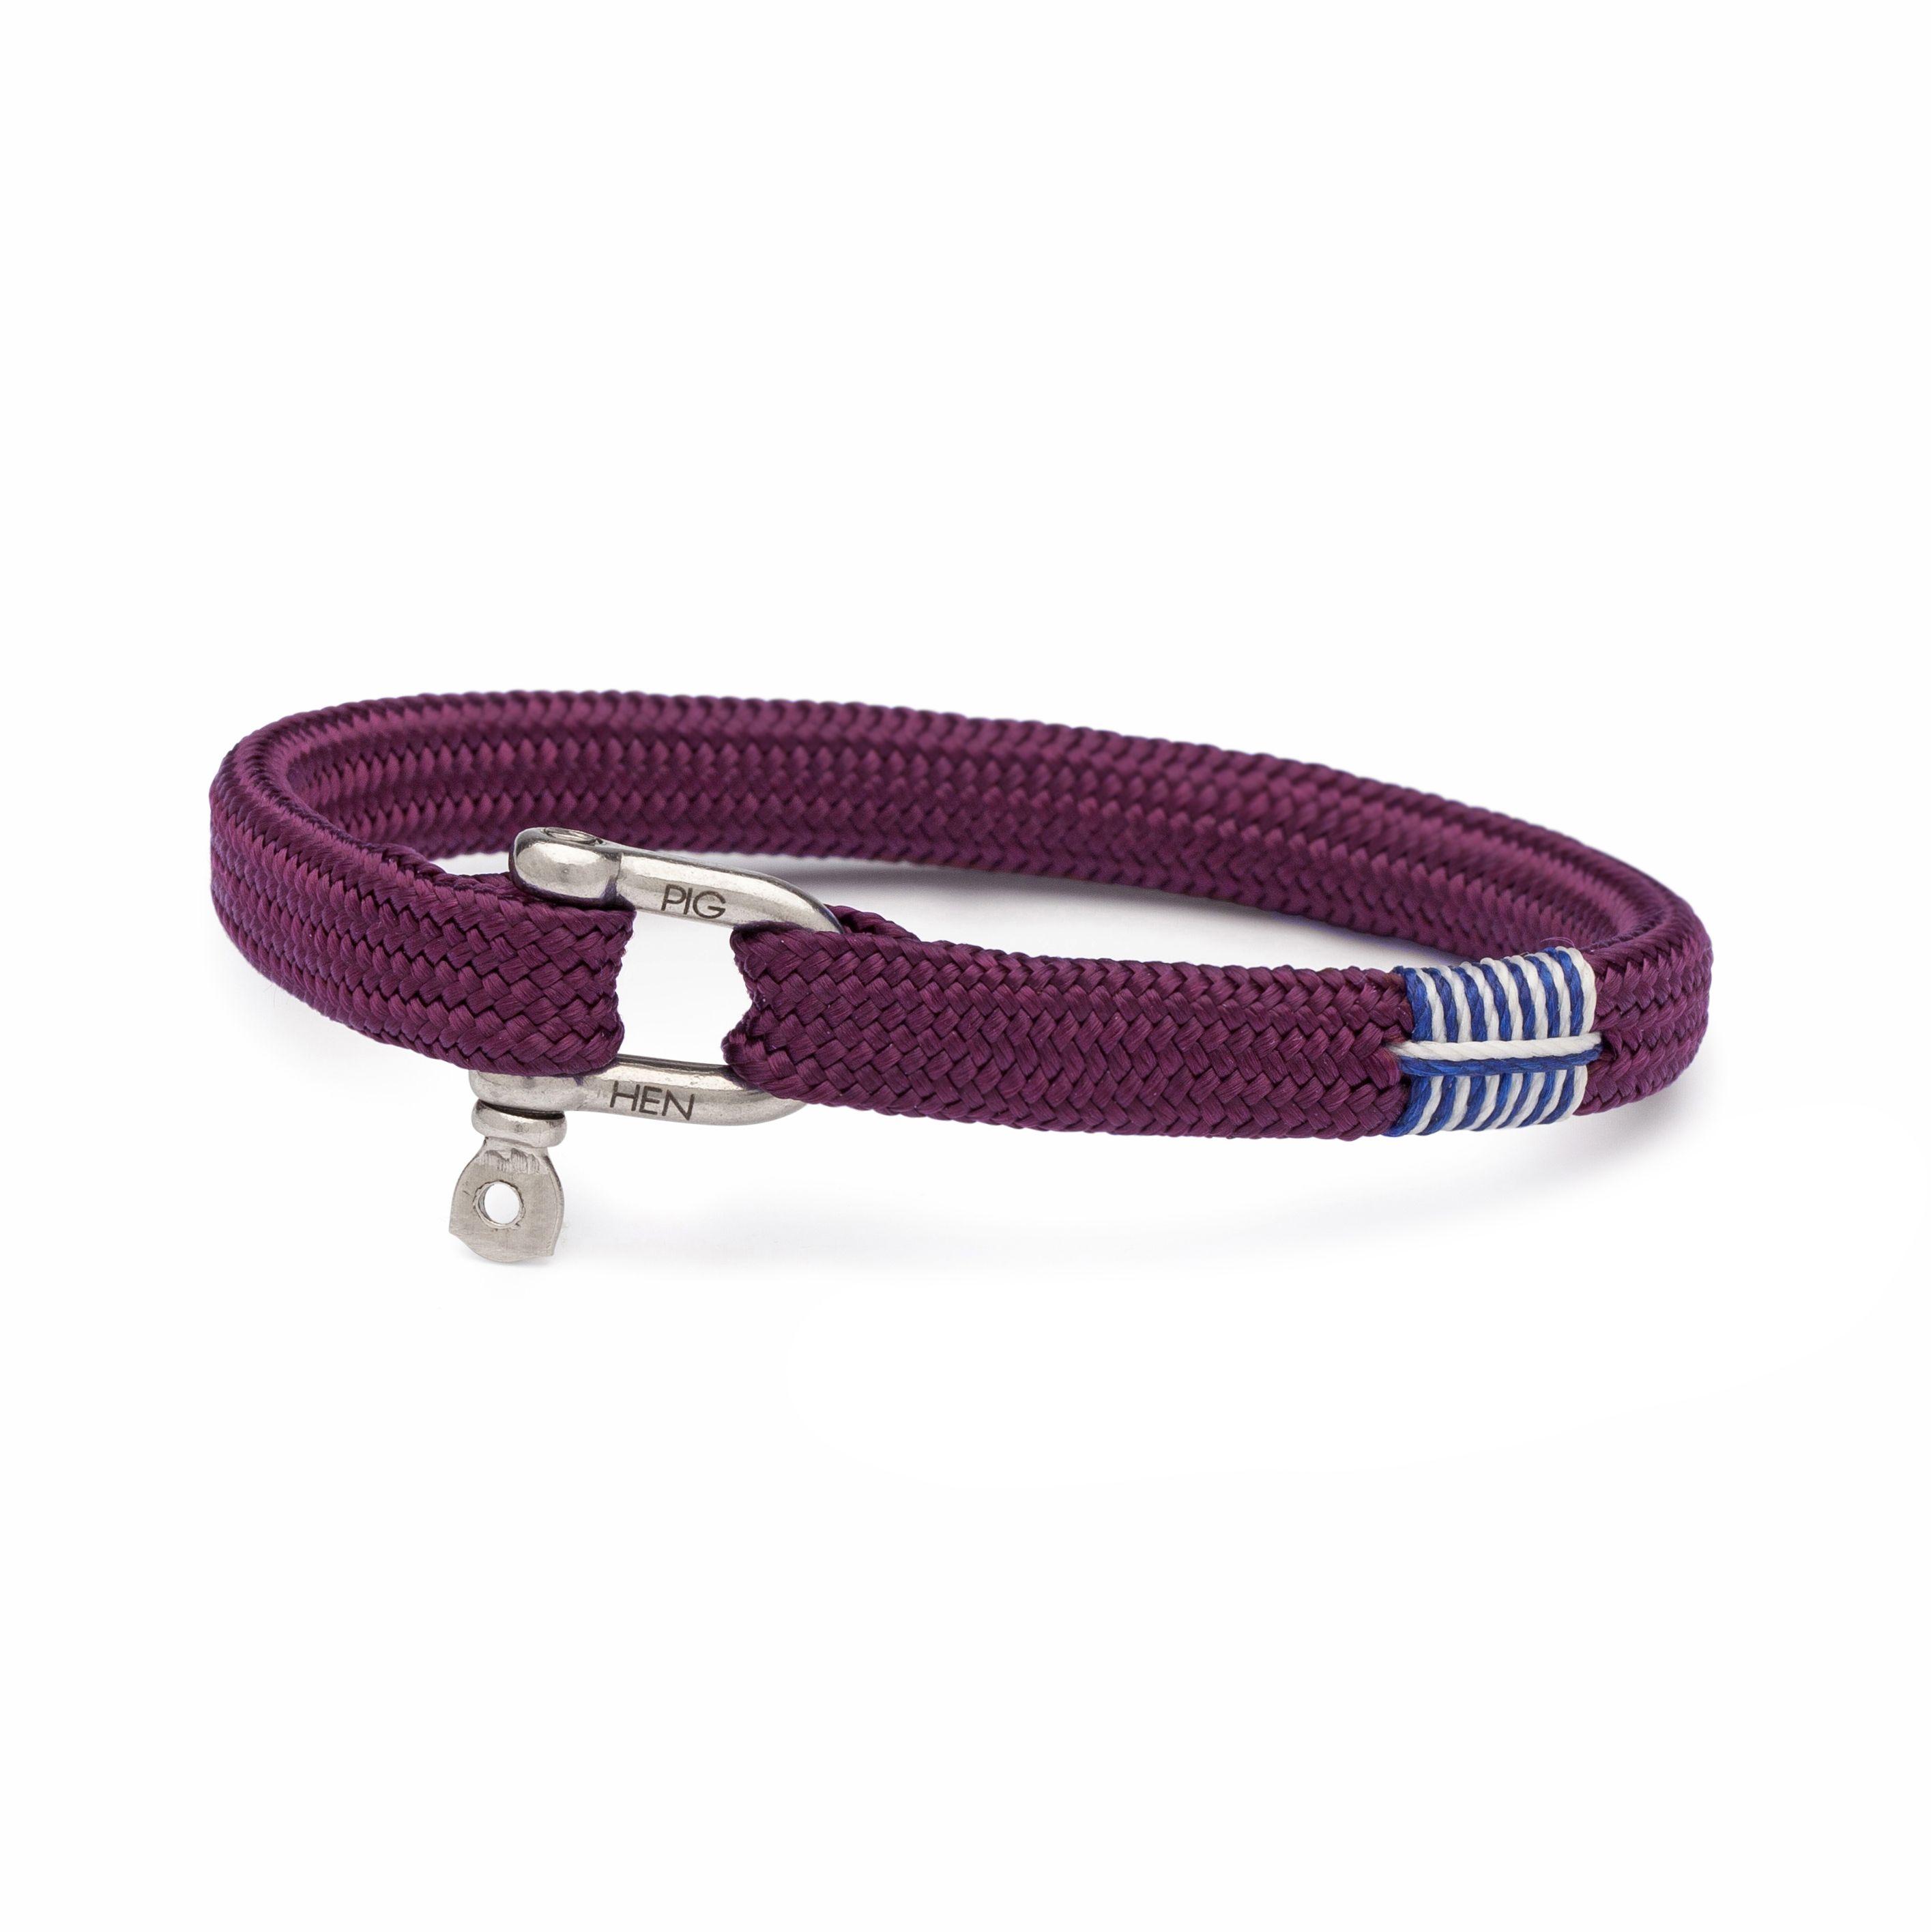 New PIG /& HEN Handmade Flat Rope Men/'s Wrist Band Bracelet Navy Size M M//L L